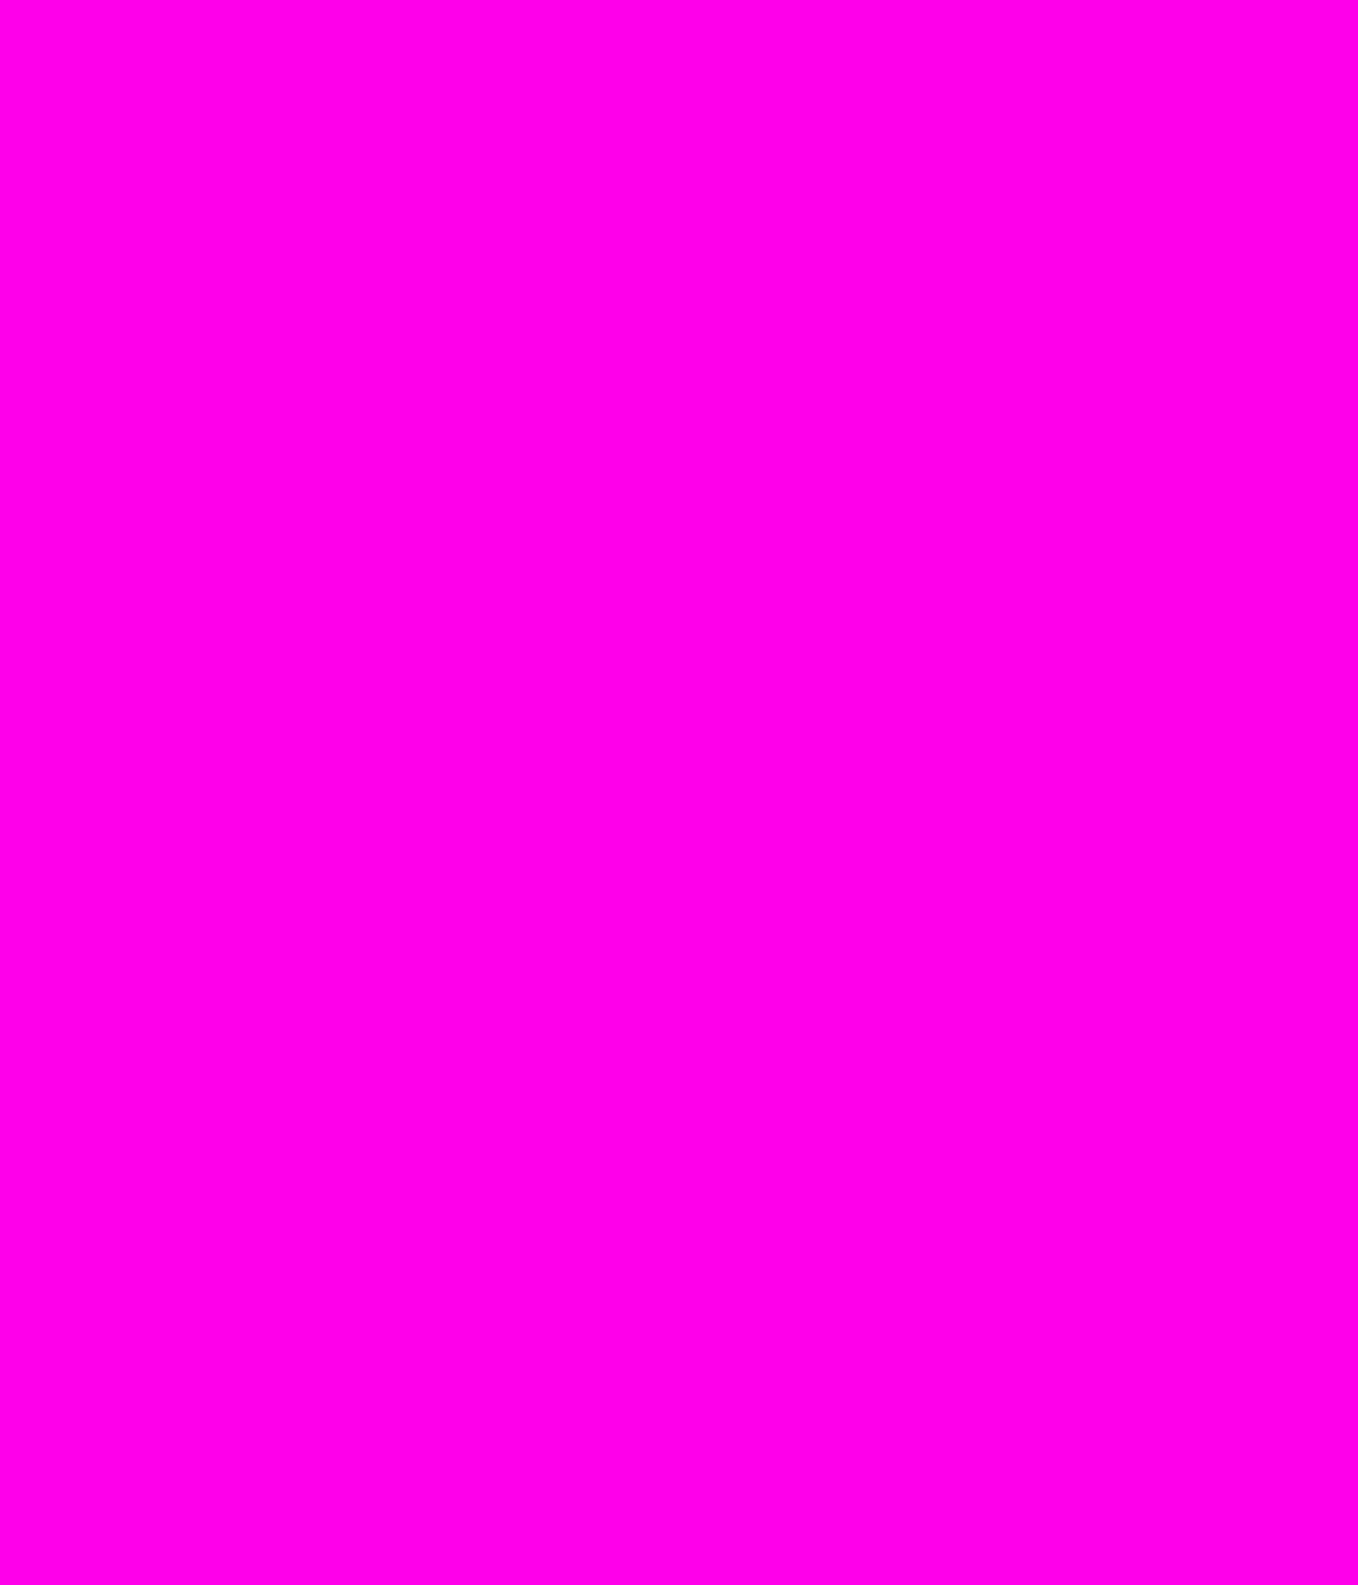 holi color png